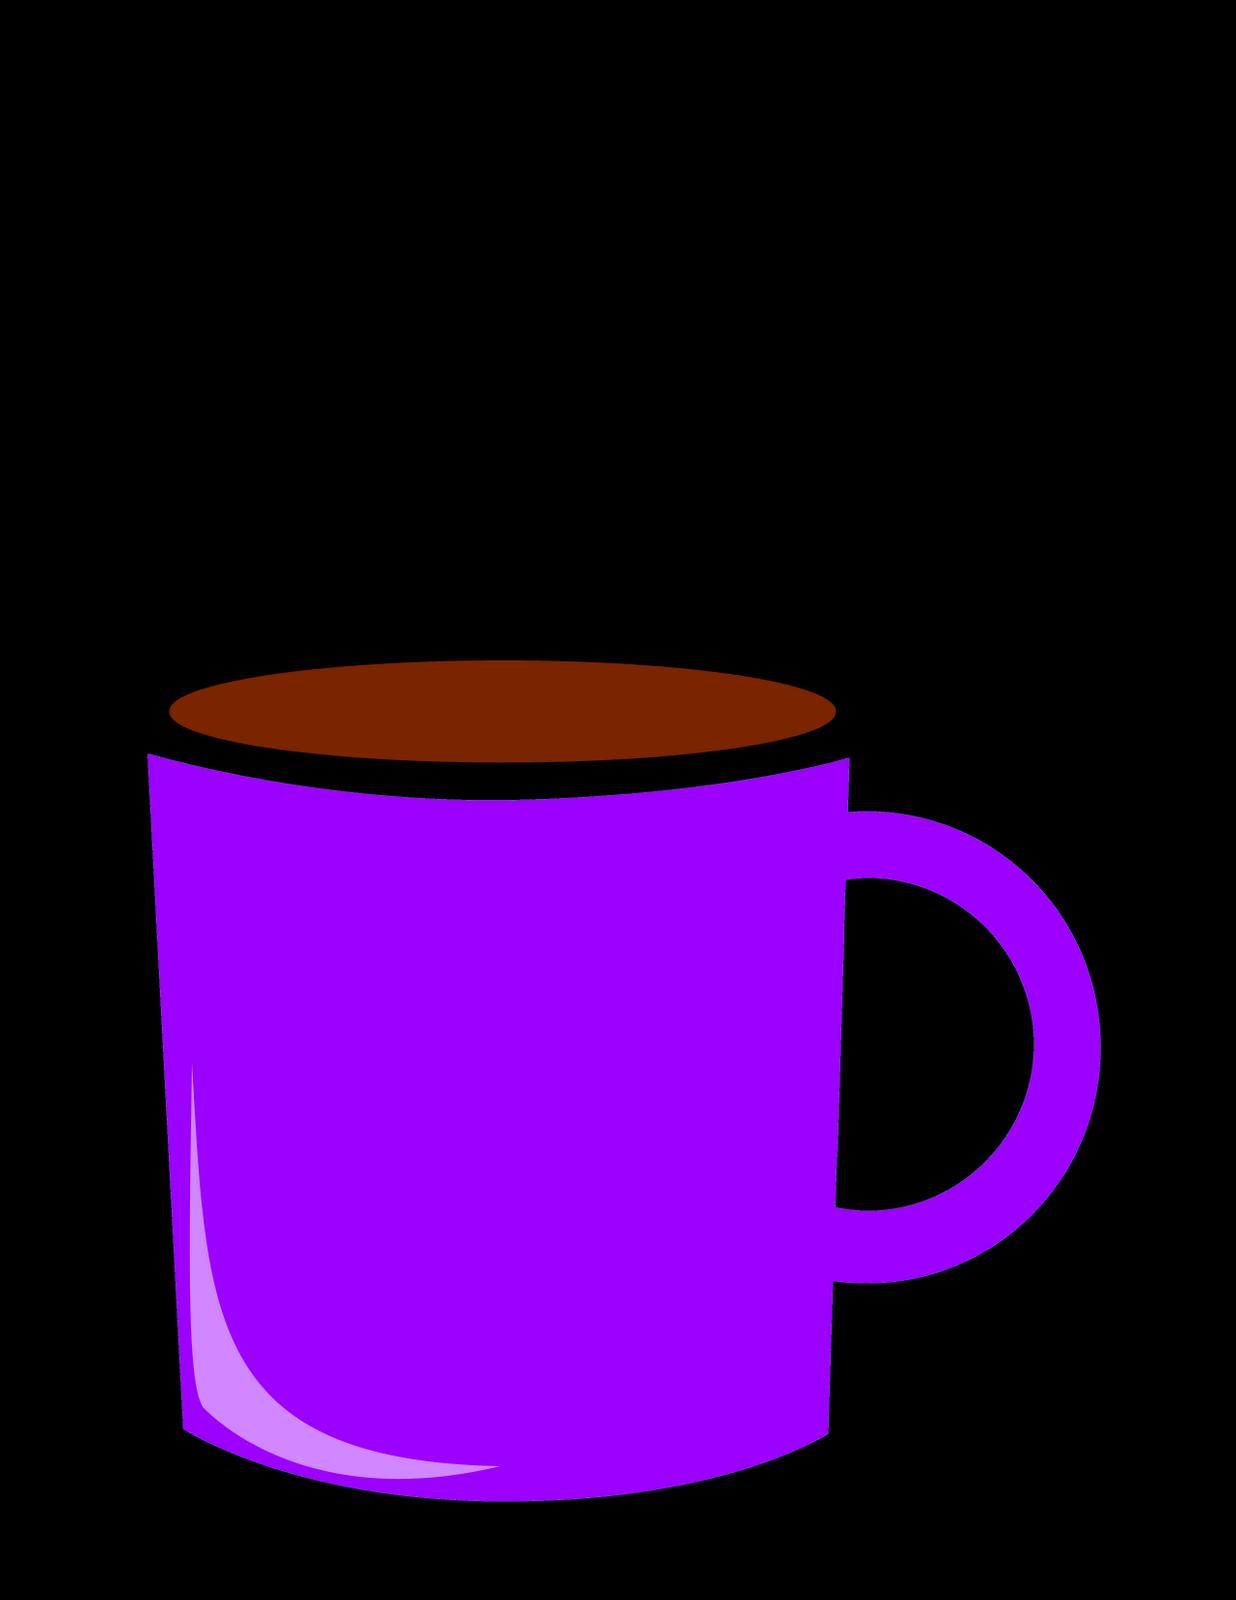 Clip Art Hot Chocolate-Clip Art Hot Chocolate-19